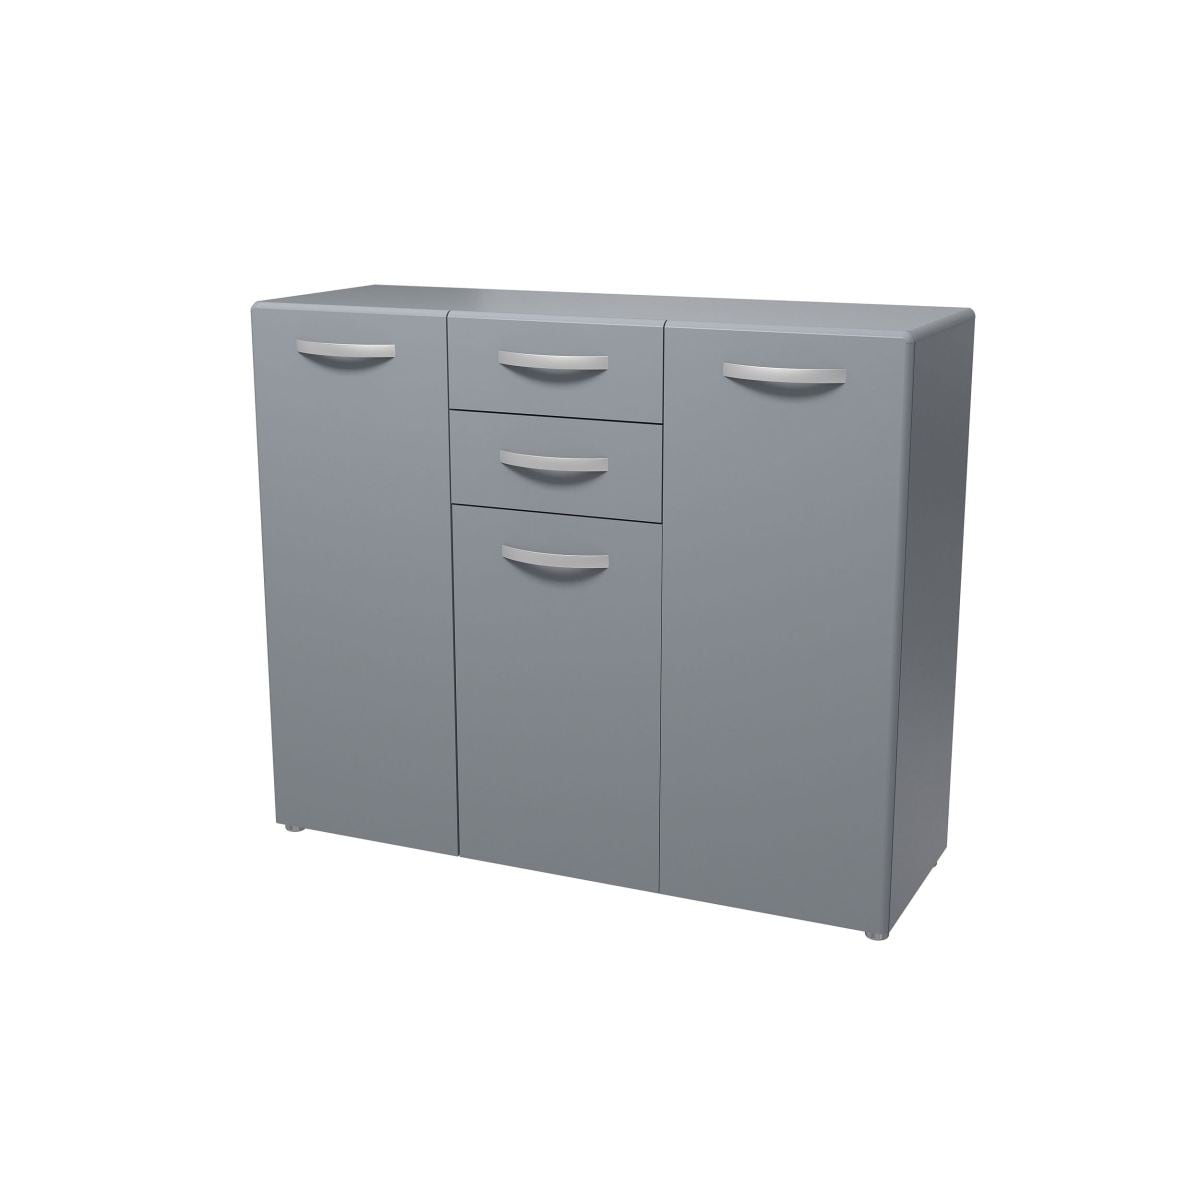 self kommode pia grau porta porta onlineshop. Black Bedroom Furniture Sets. Home Design Ideas